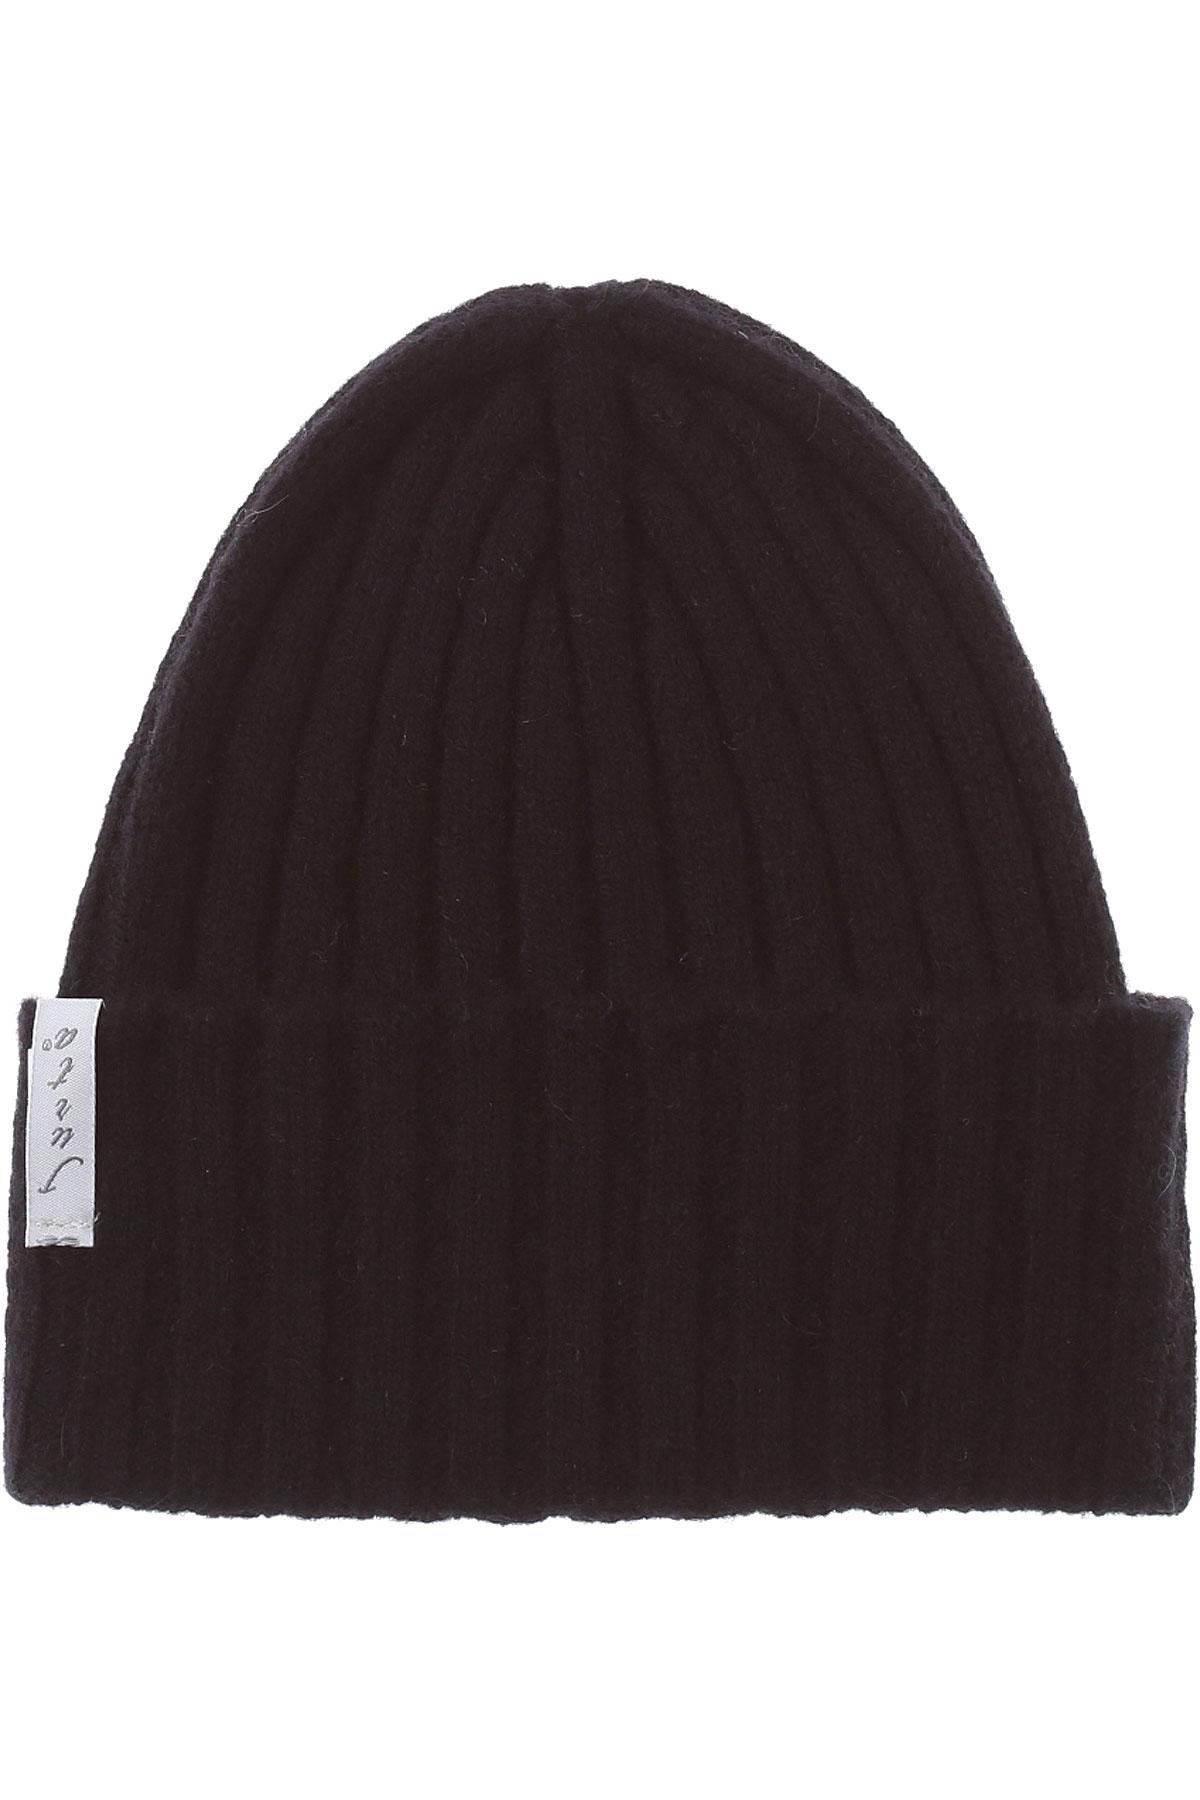 Jurta Kids Hats for Boys On Sale, Black, Cashemere, 2019